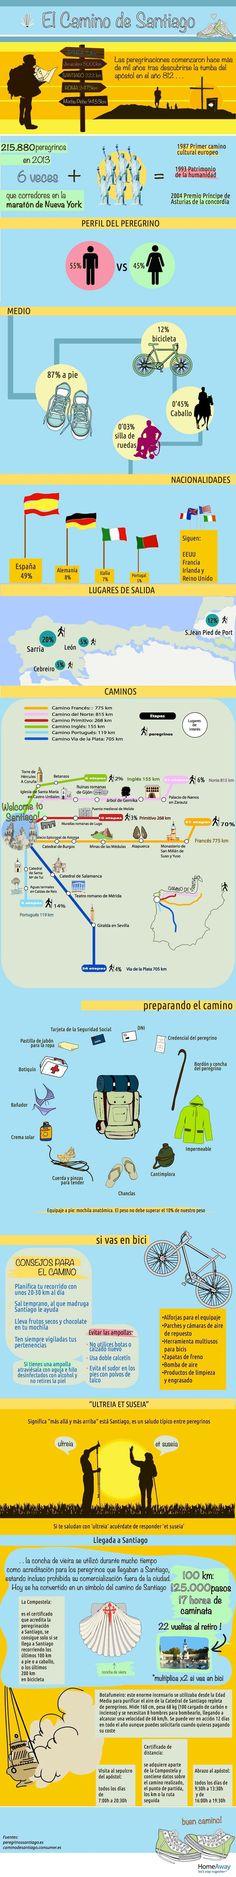 El Camino de Santiago #infografia